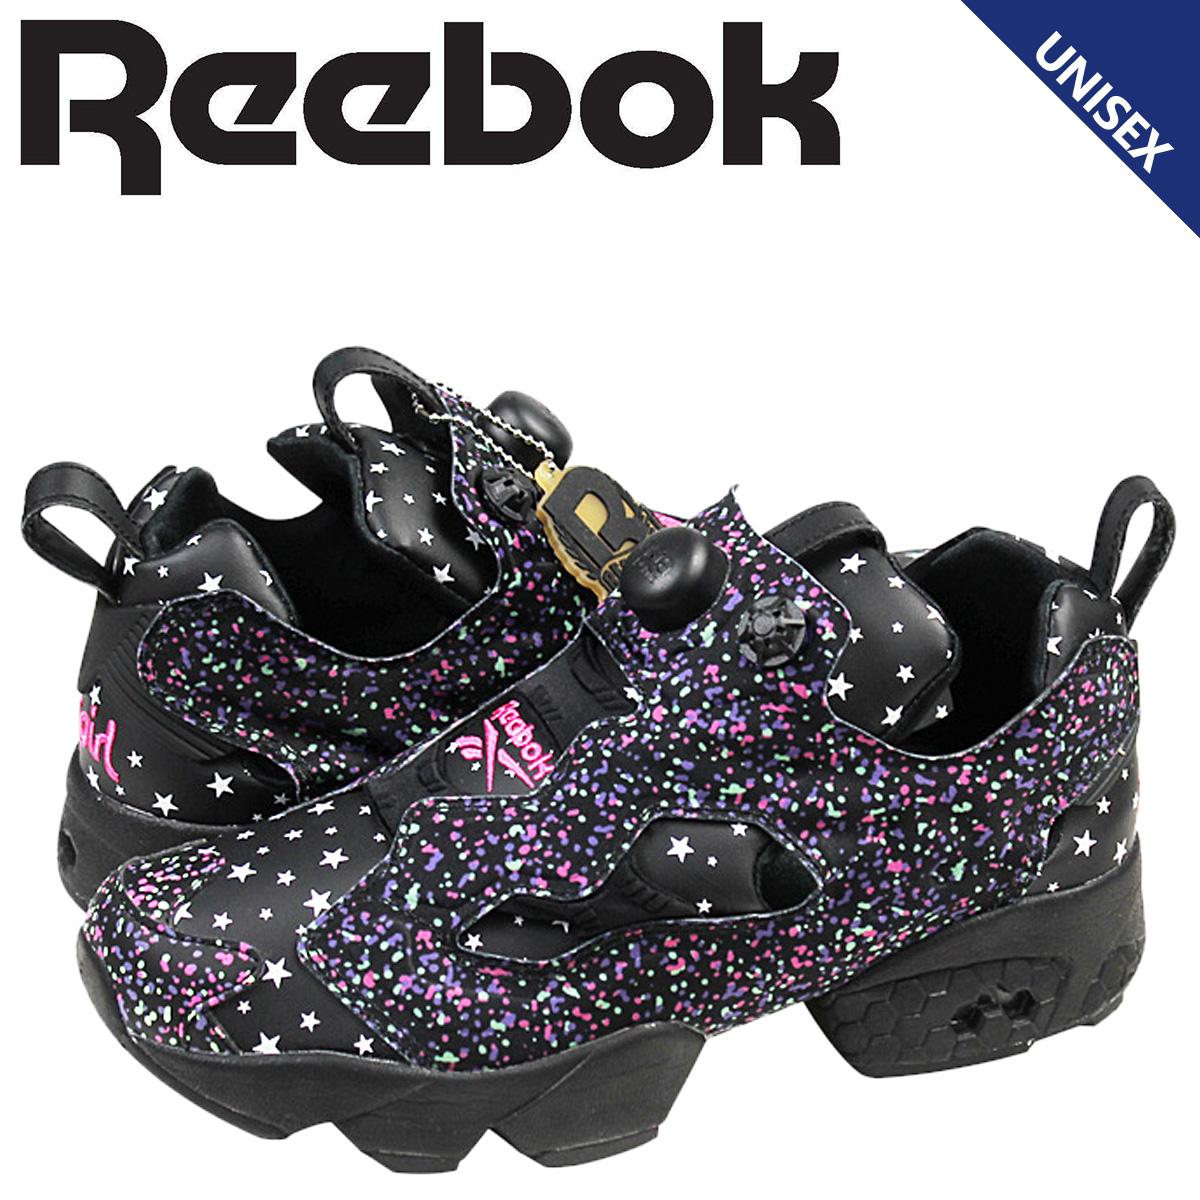 Point 2 x Reebok Reebok×x girl INSTA PUMP FURY OG sneaker insta pump fury original leather men's women's collaboration with 20th anniversary of M43197